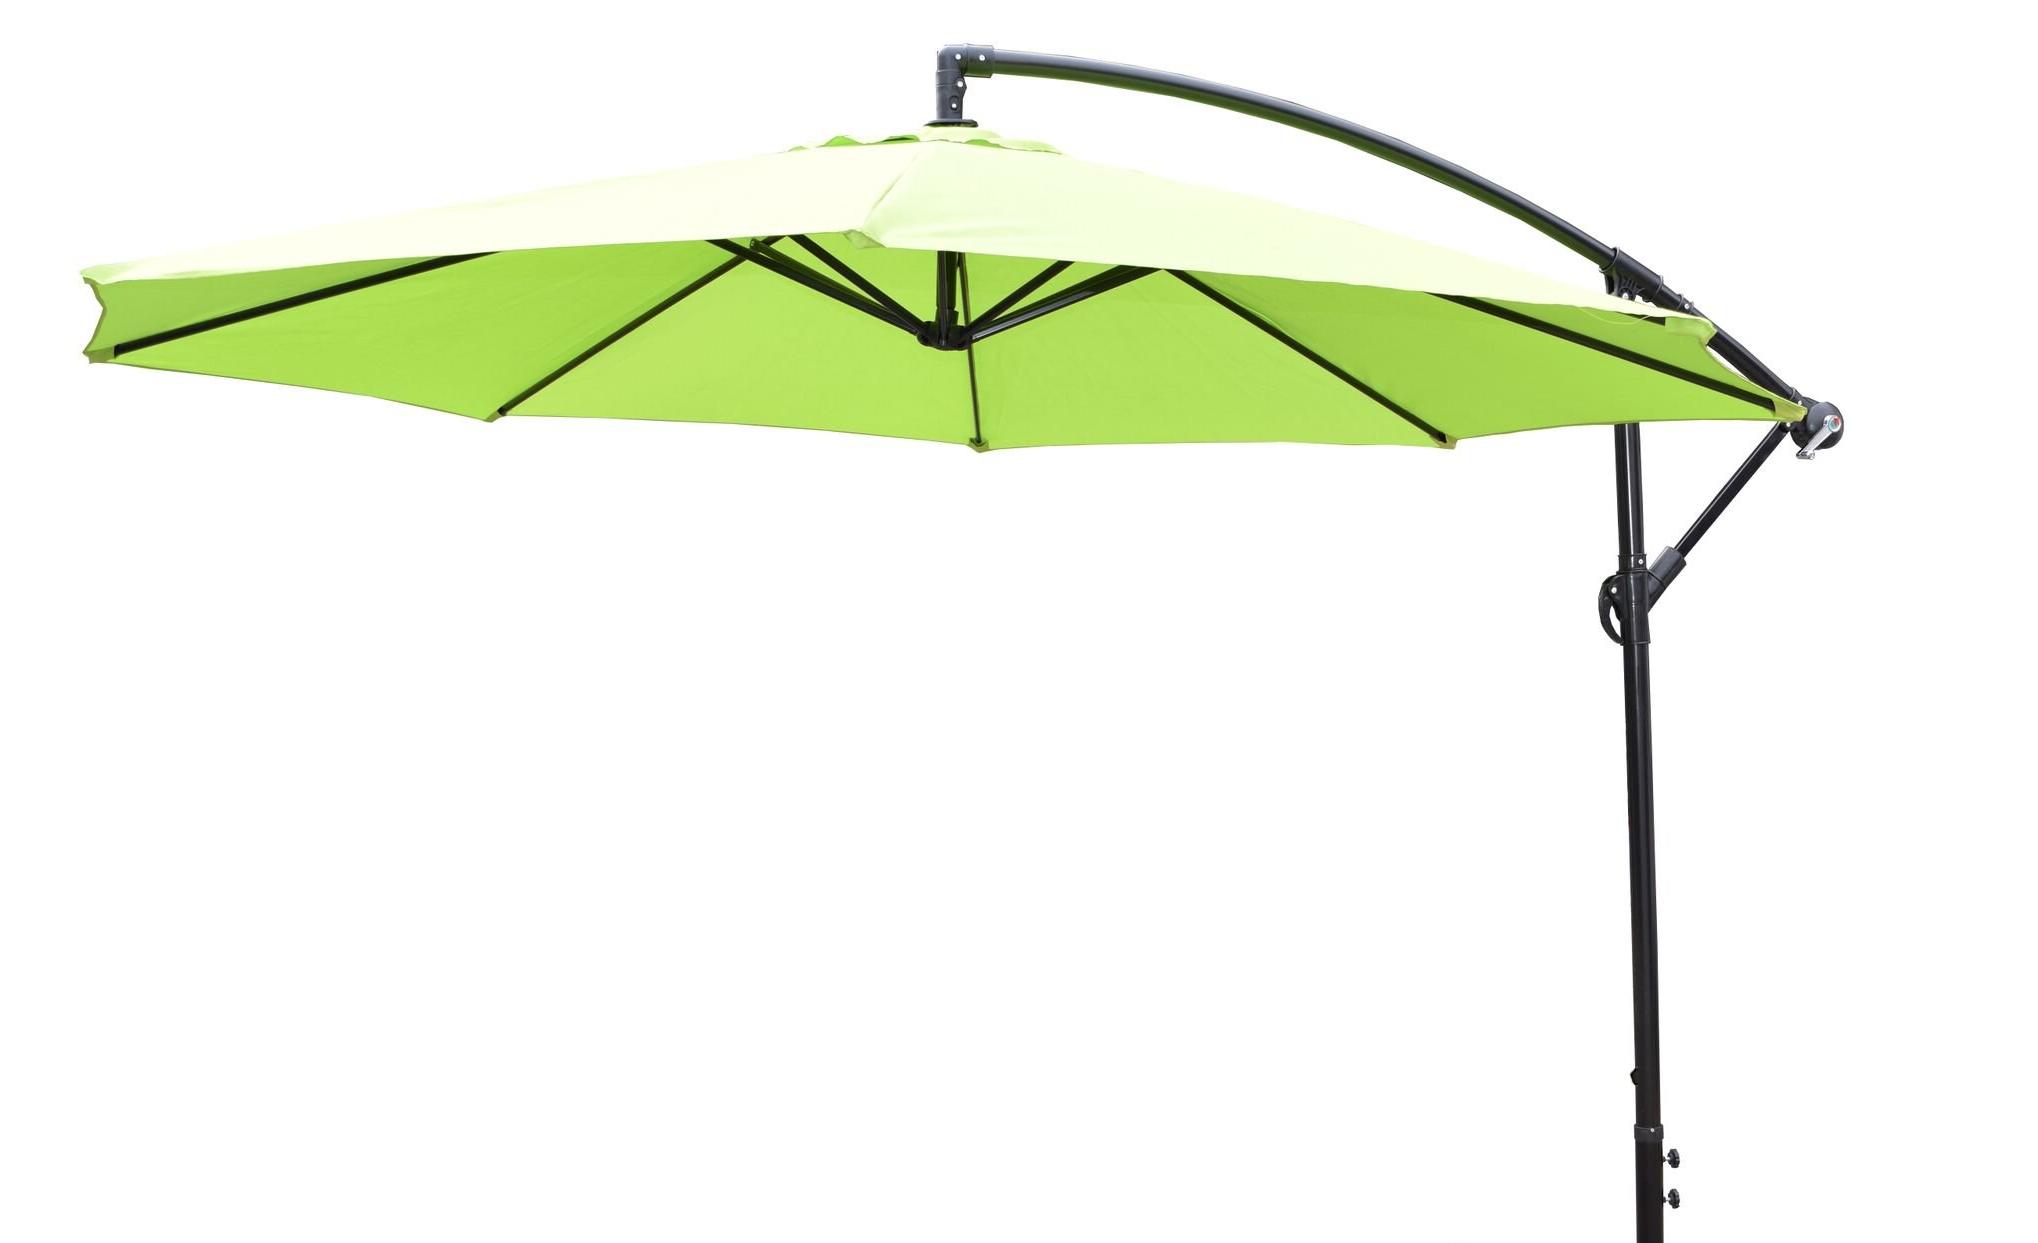 Most Recent Auda 10' Cantilever Umbrella With Olen Cantilever Umbrellas (Gallery 8 of 20)